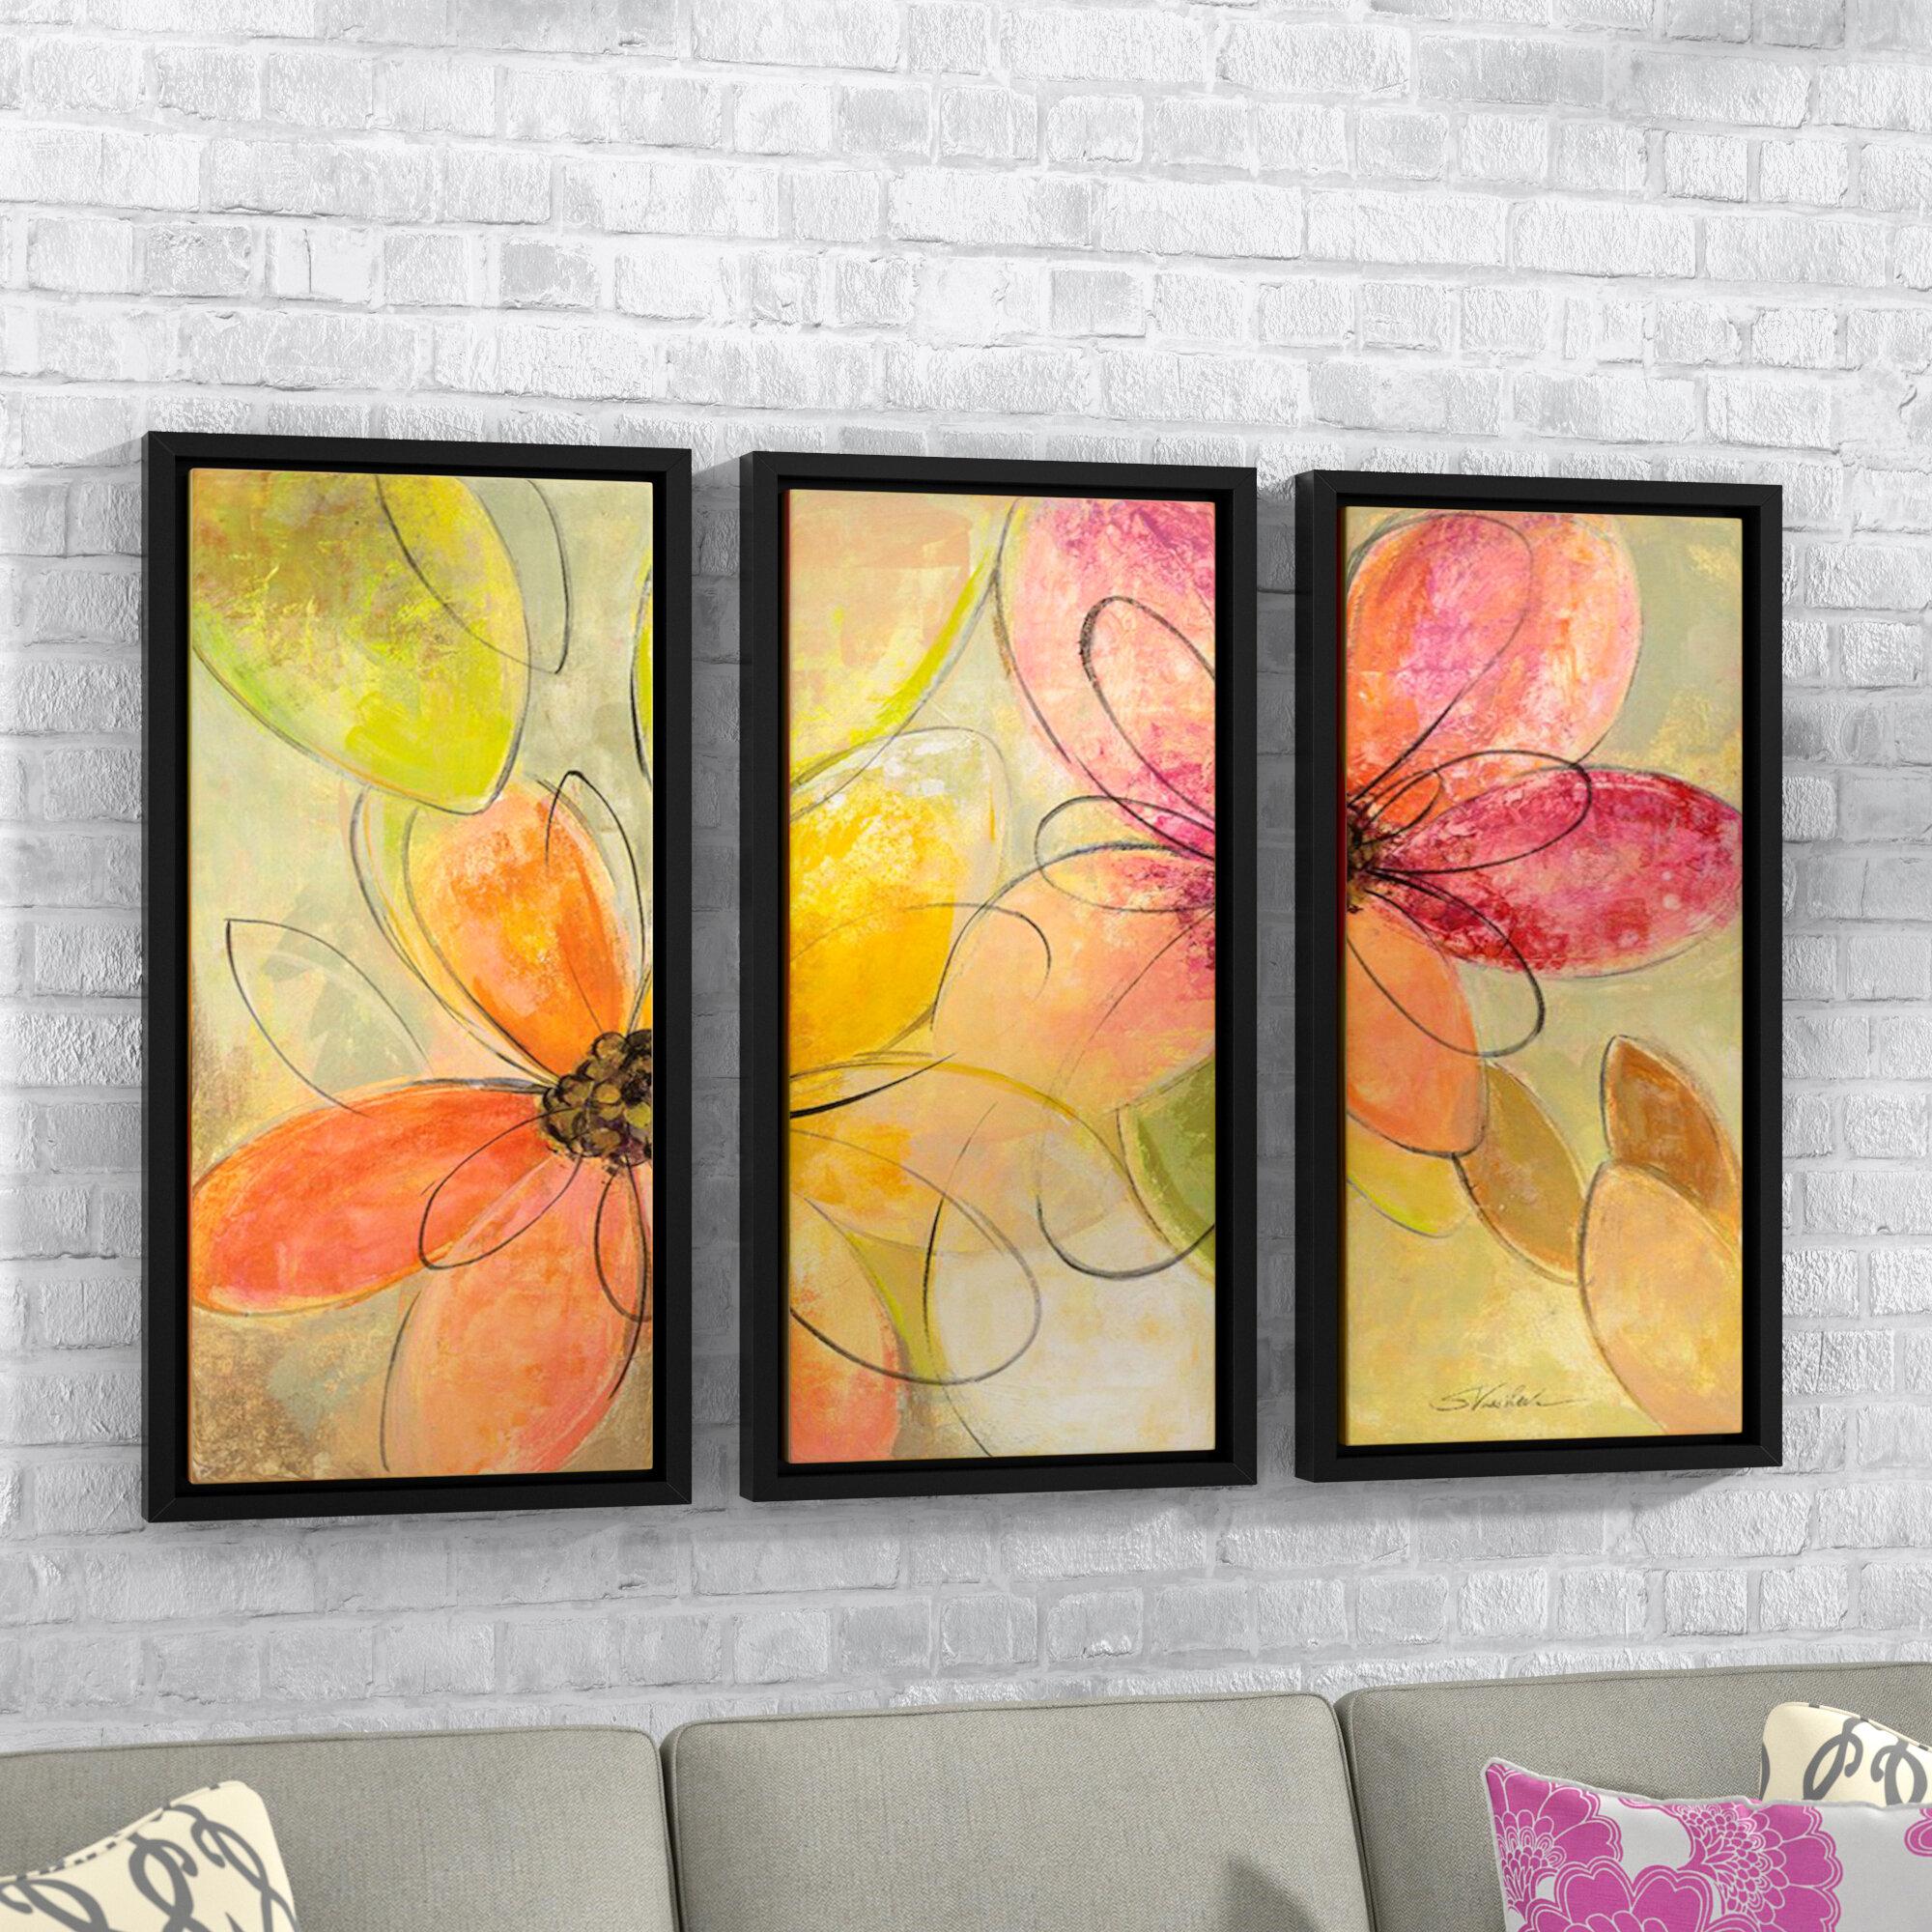 Latitude run neon floral by silvia vassileva 3 piece framed painting print set wayfair ca